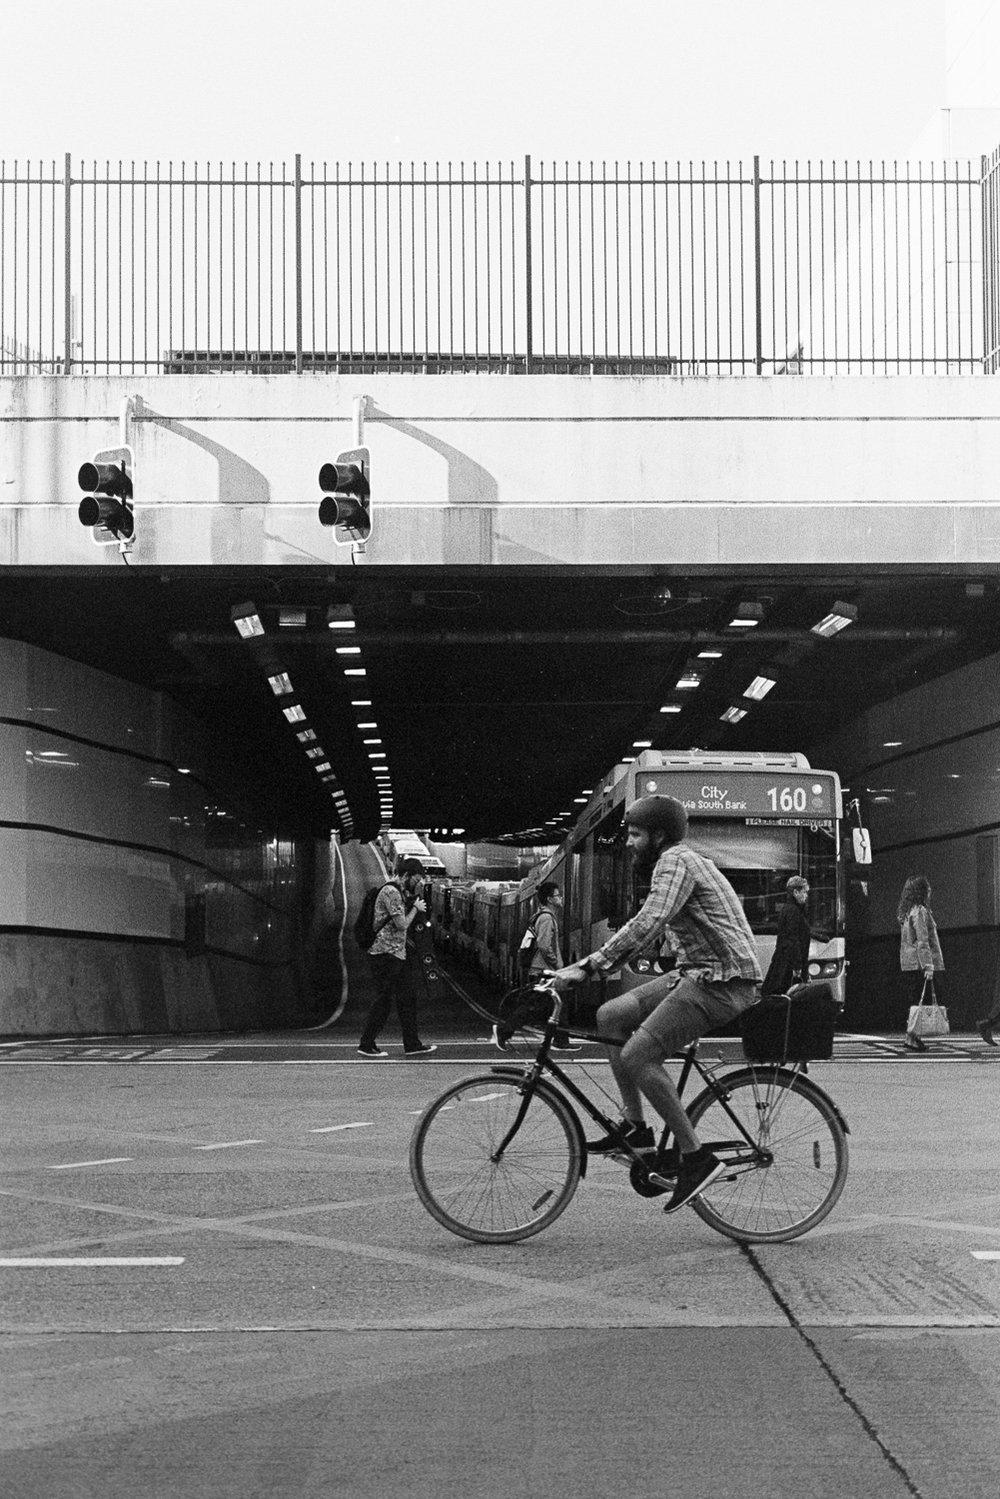 20170719 - Roll 146 - 006-Nick-Bedford,-Photographer-Black and White, Brisbane, Kodak Tri-X 400, Leica M7, Street Photography.jpg